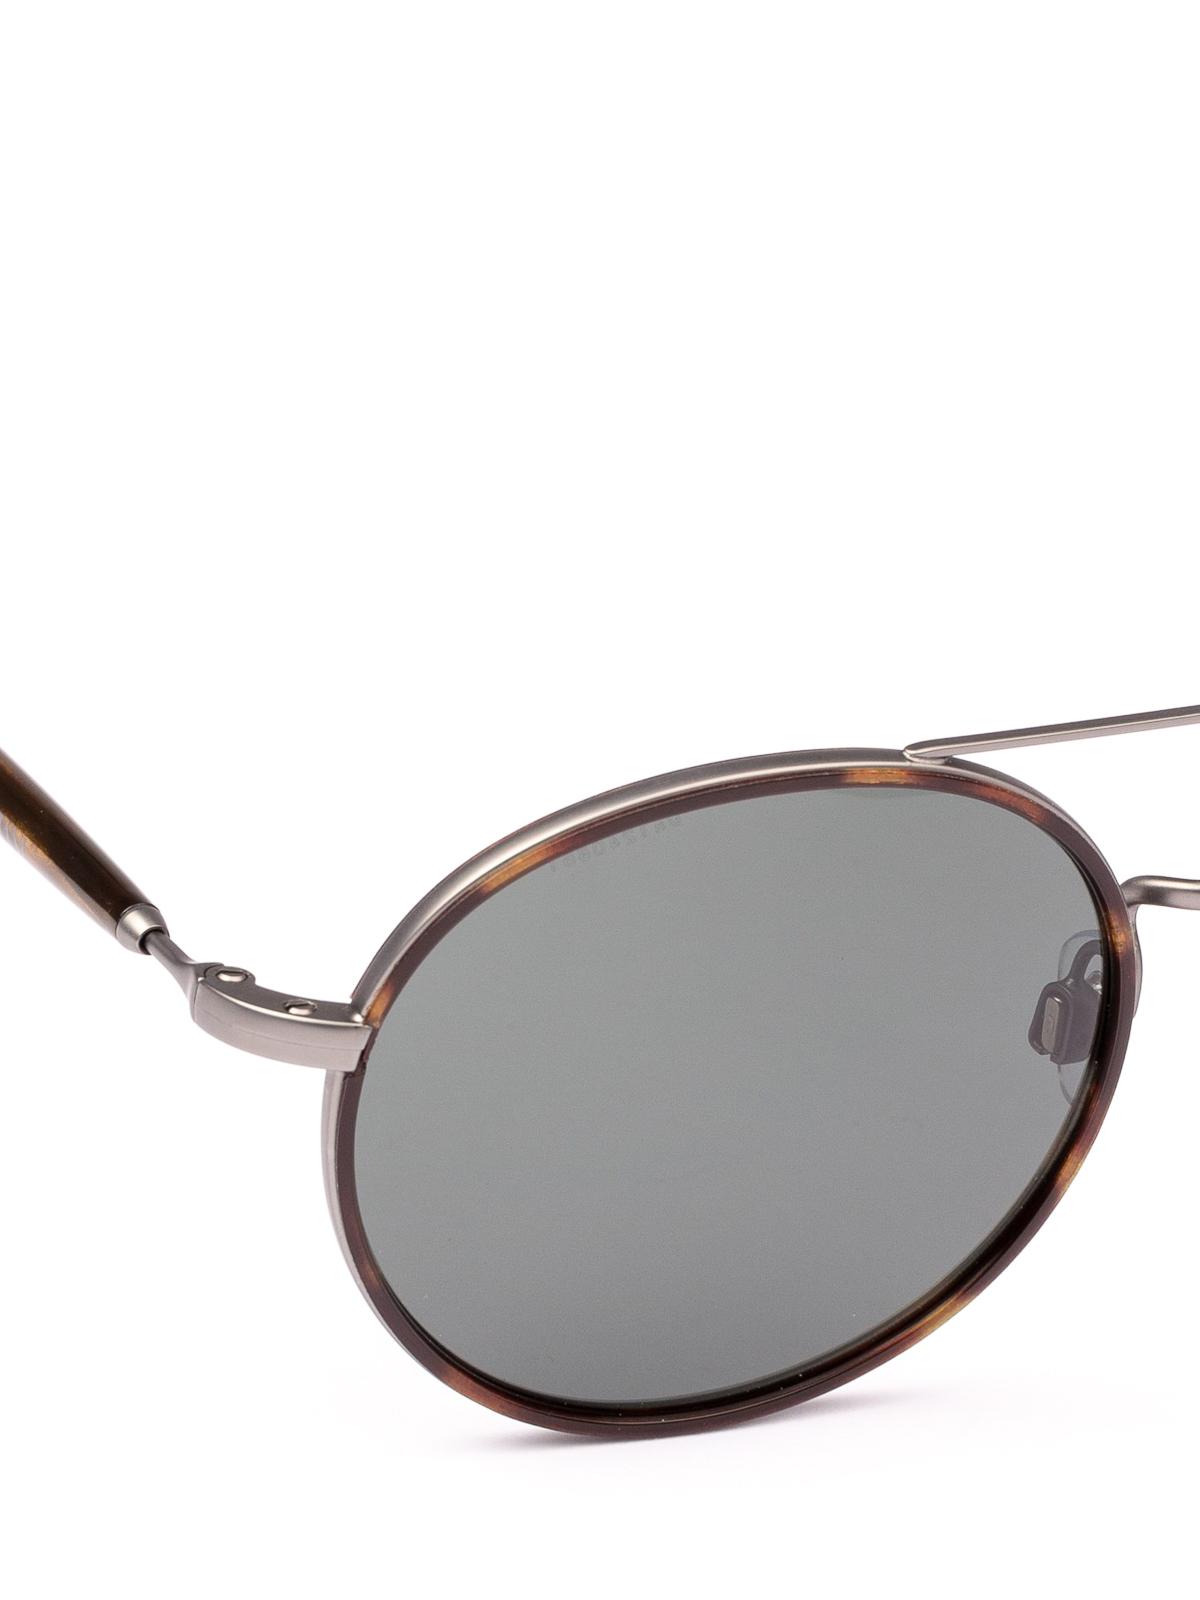 de4ef7b3ab6d iKRIX GIORGIO ARMANI  sunglasses - Dark havana and gunmetal round sunglasses